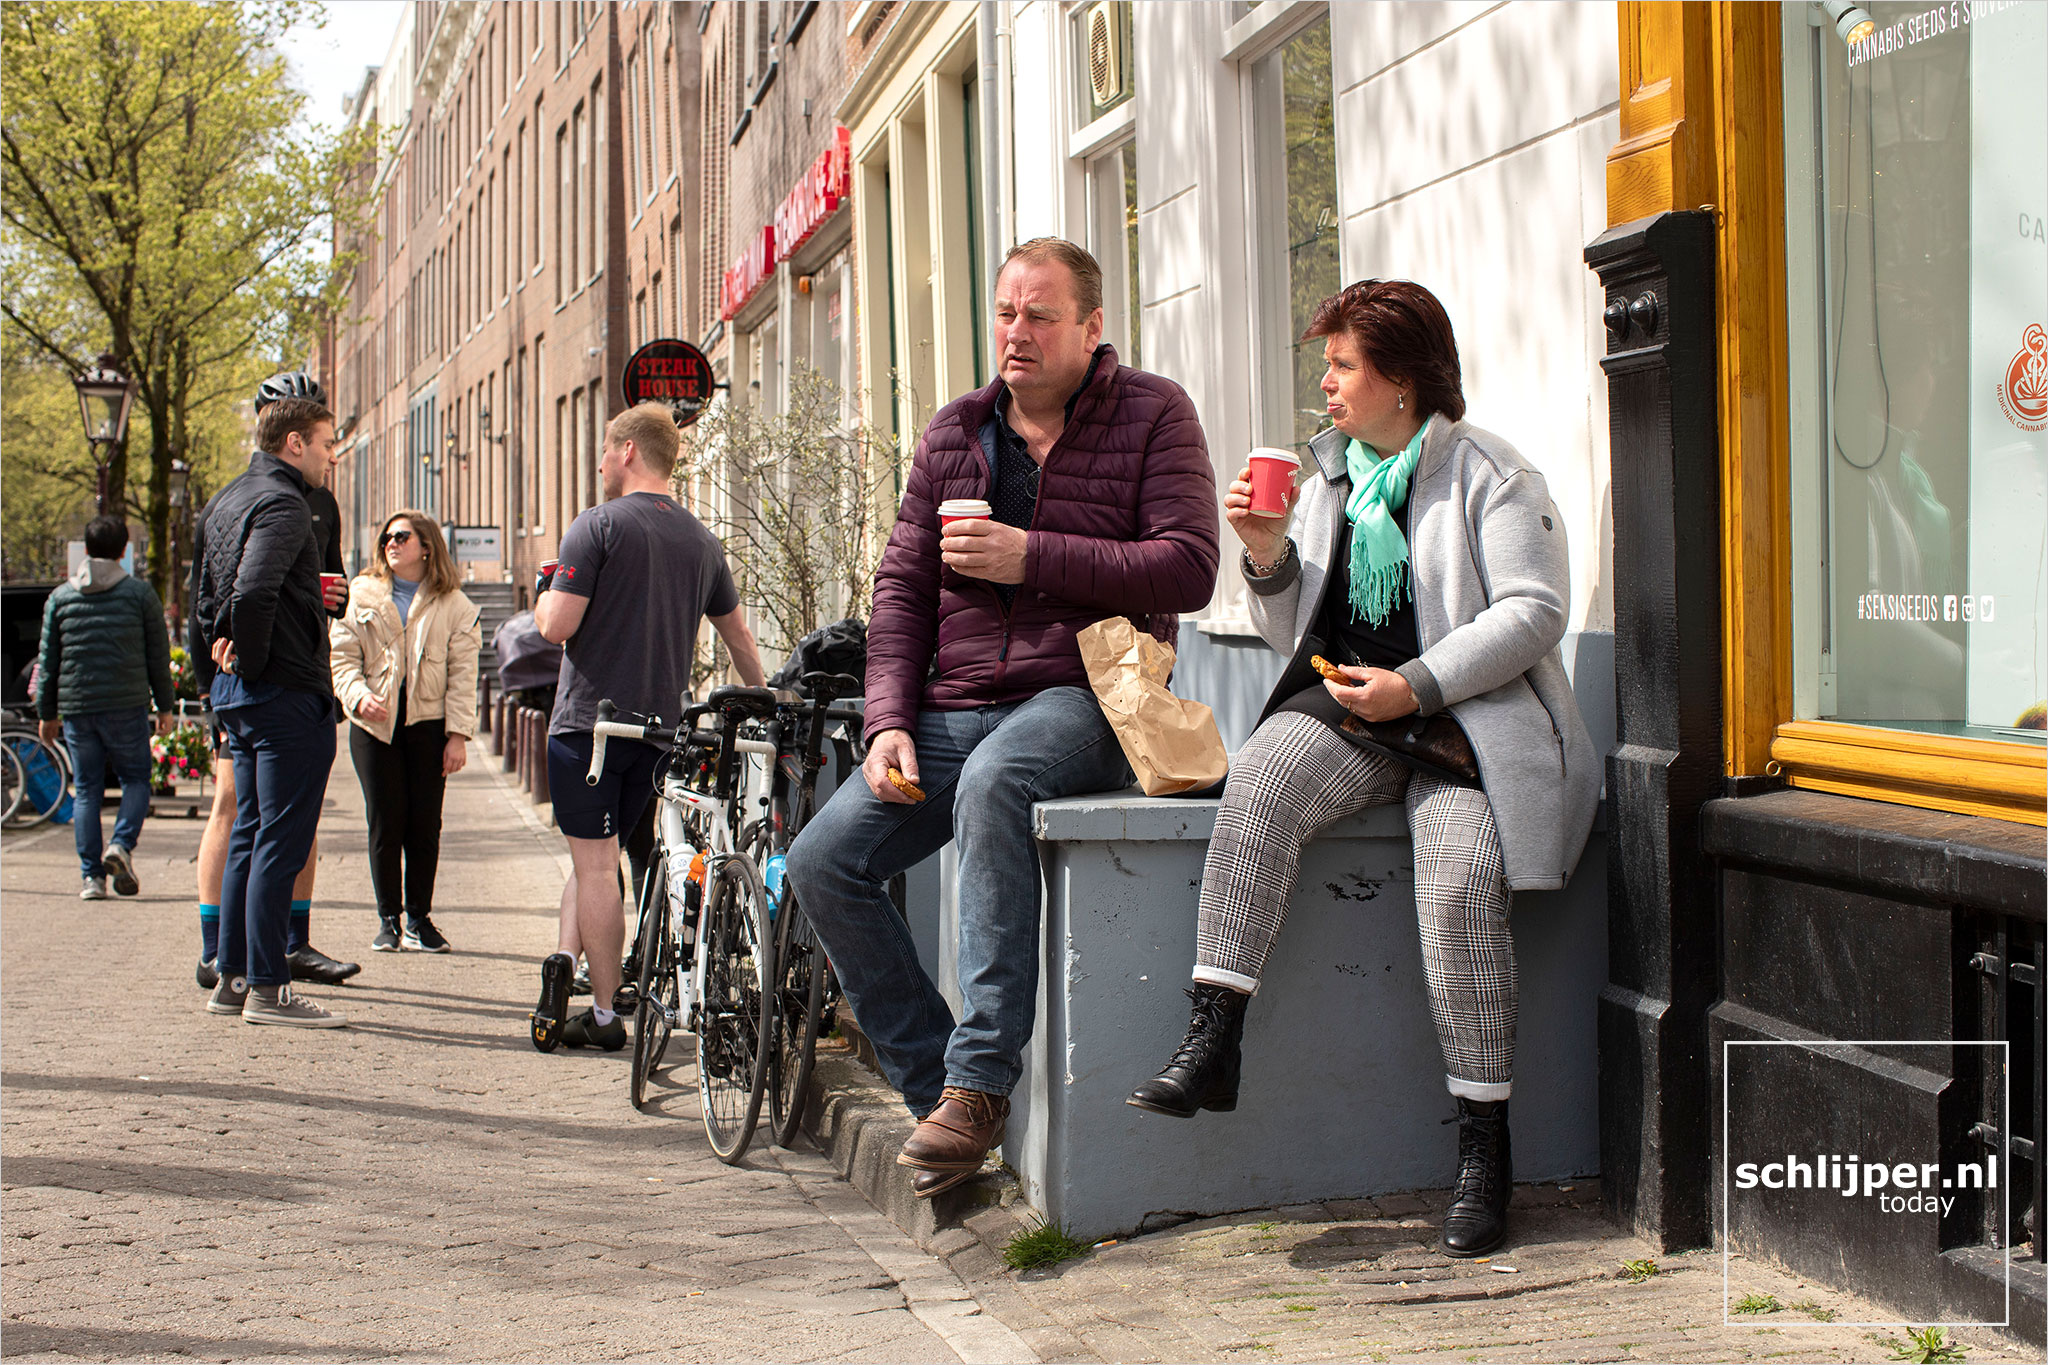 The Netherlands, Amsterdam, 21 april 2021